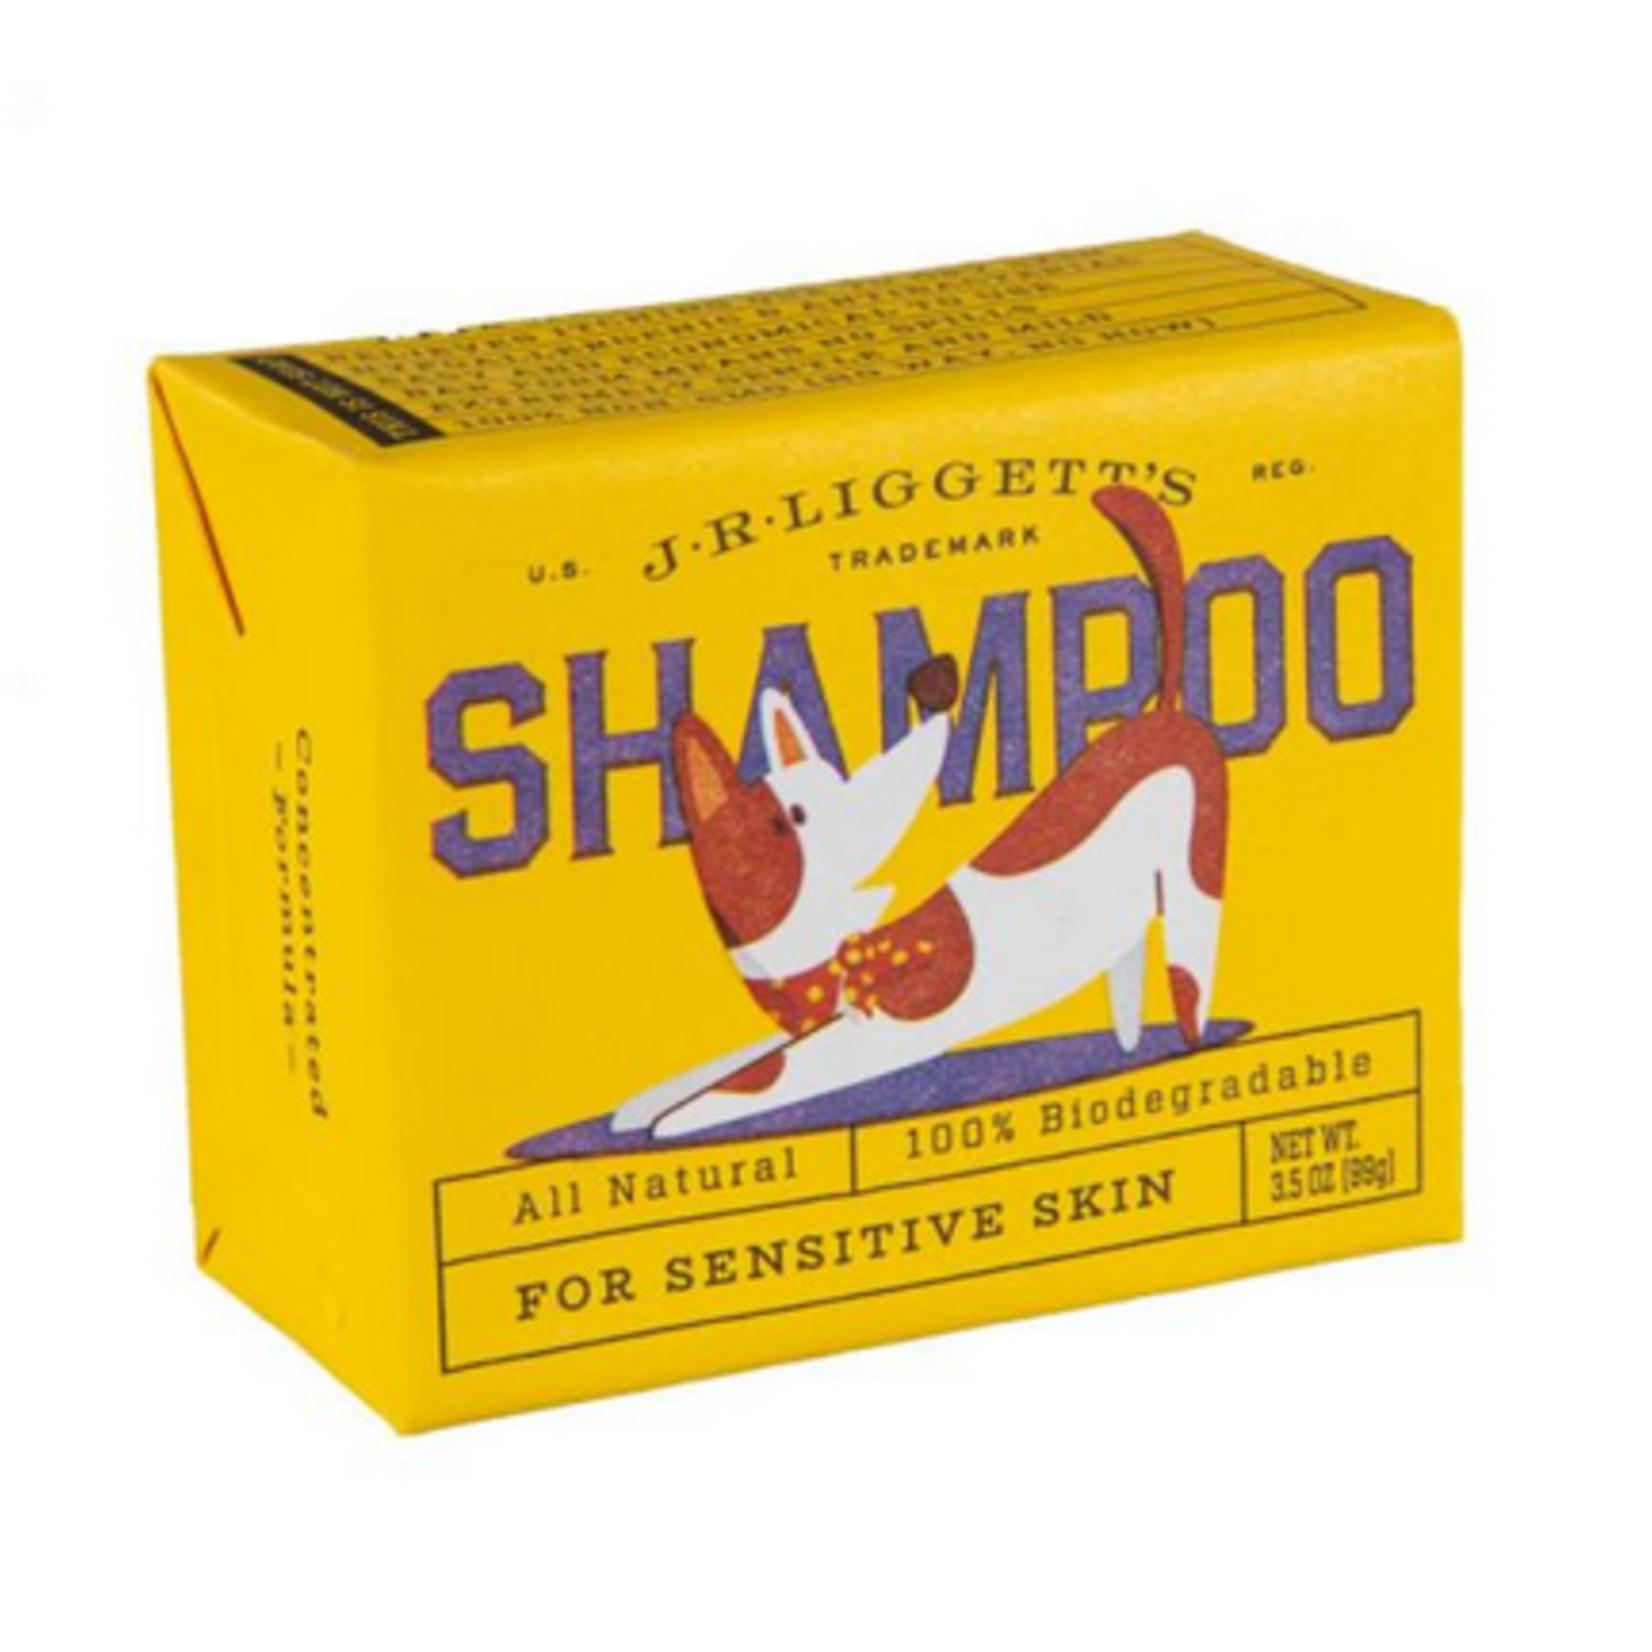 J.R. Liggett's Dog Shampoo Bar for Sensitive Skin